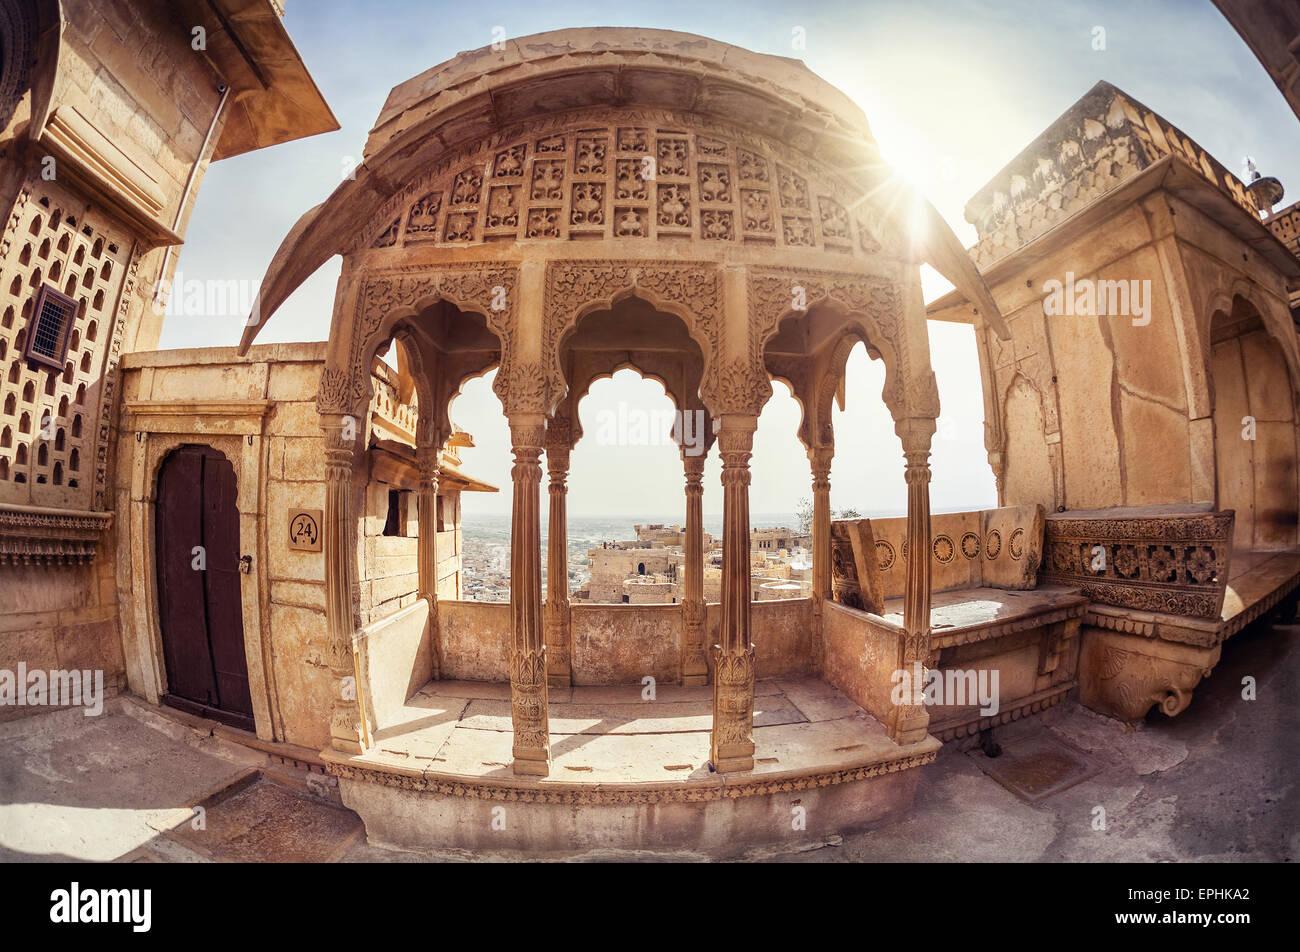 Zenana Mahal im City Palace Museum von Jaisalmer Fort, Rajasthan, Indien Stockbild